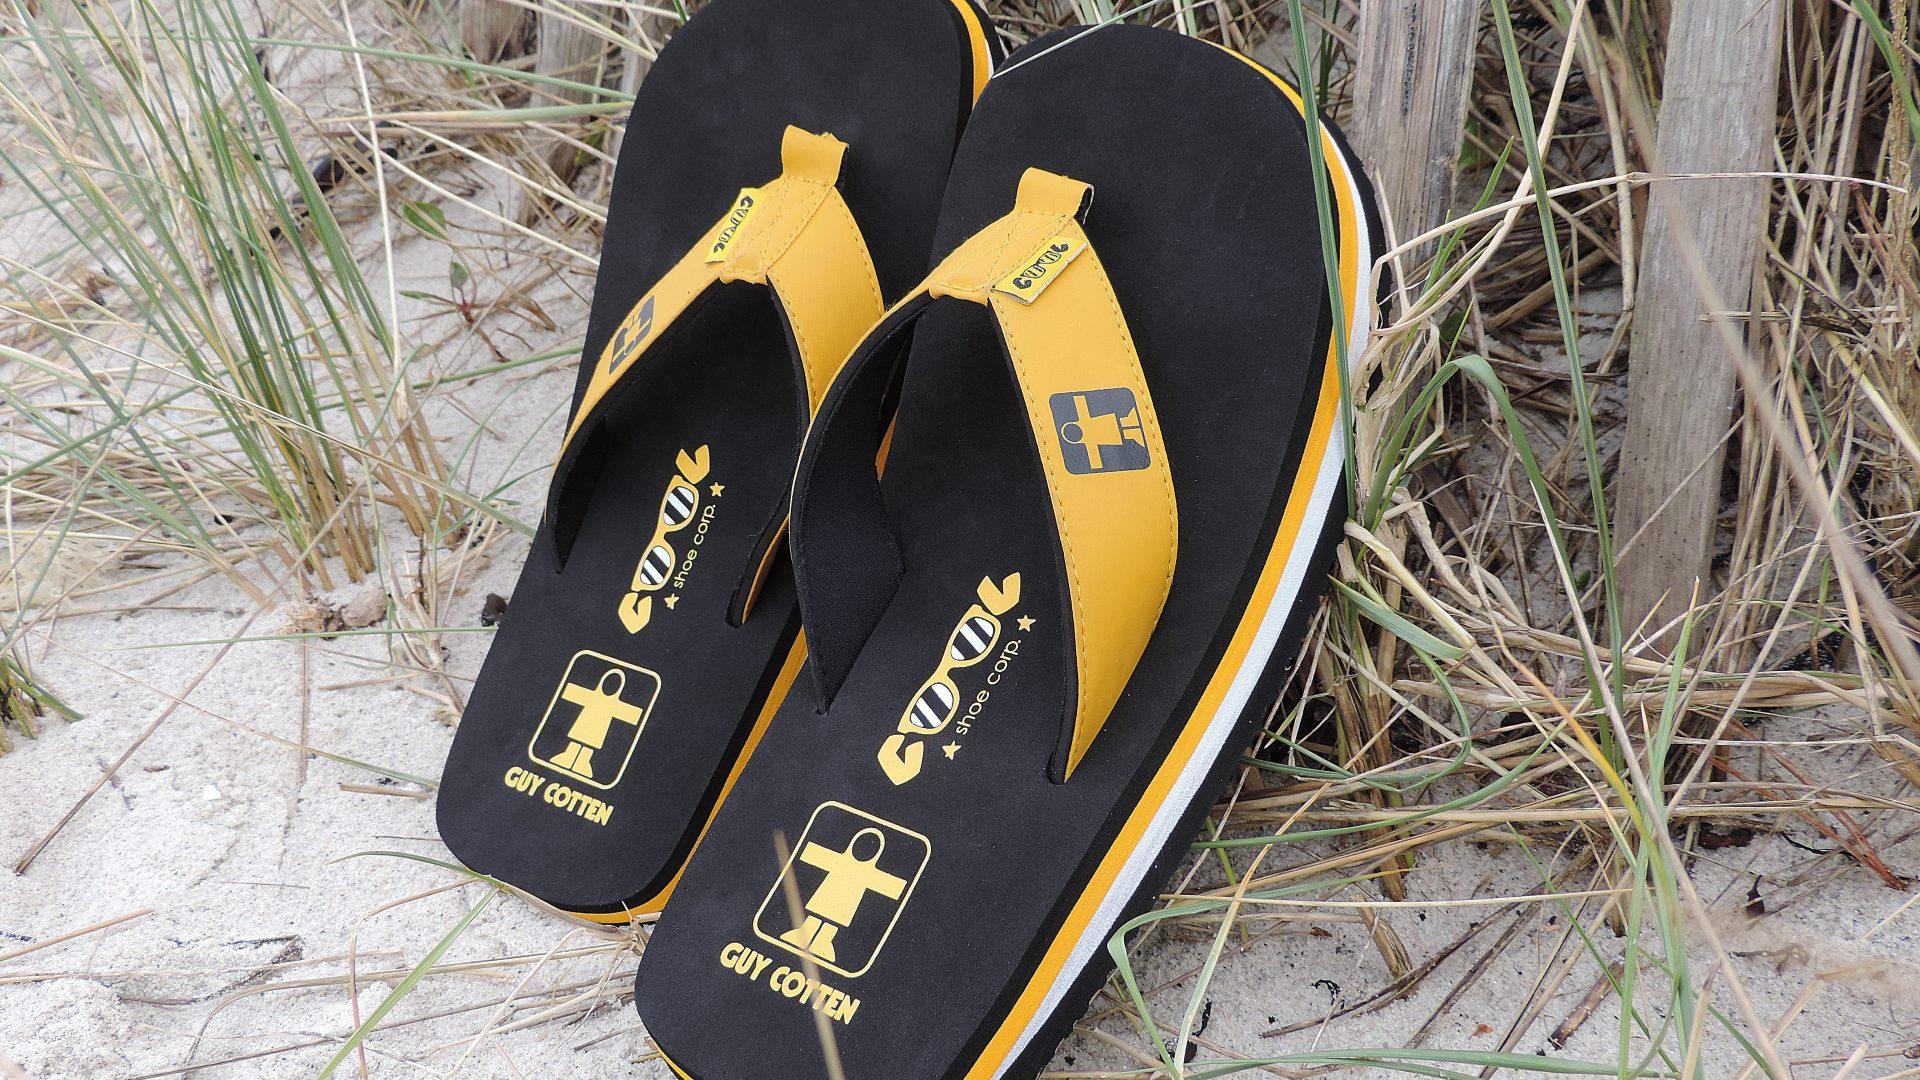 Cool Shoe X Guy Cotten